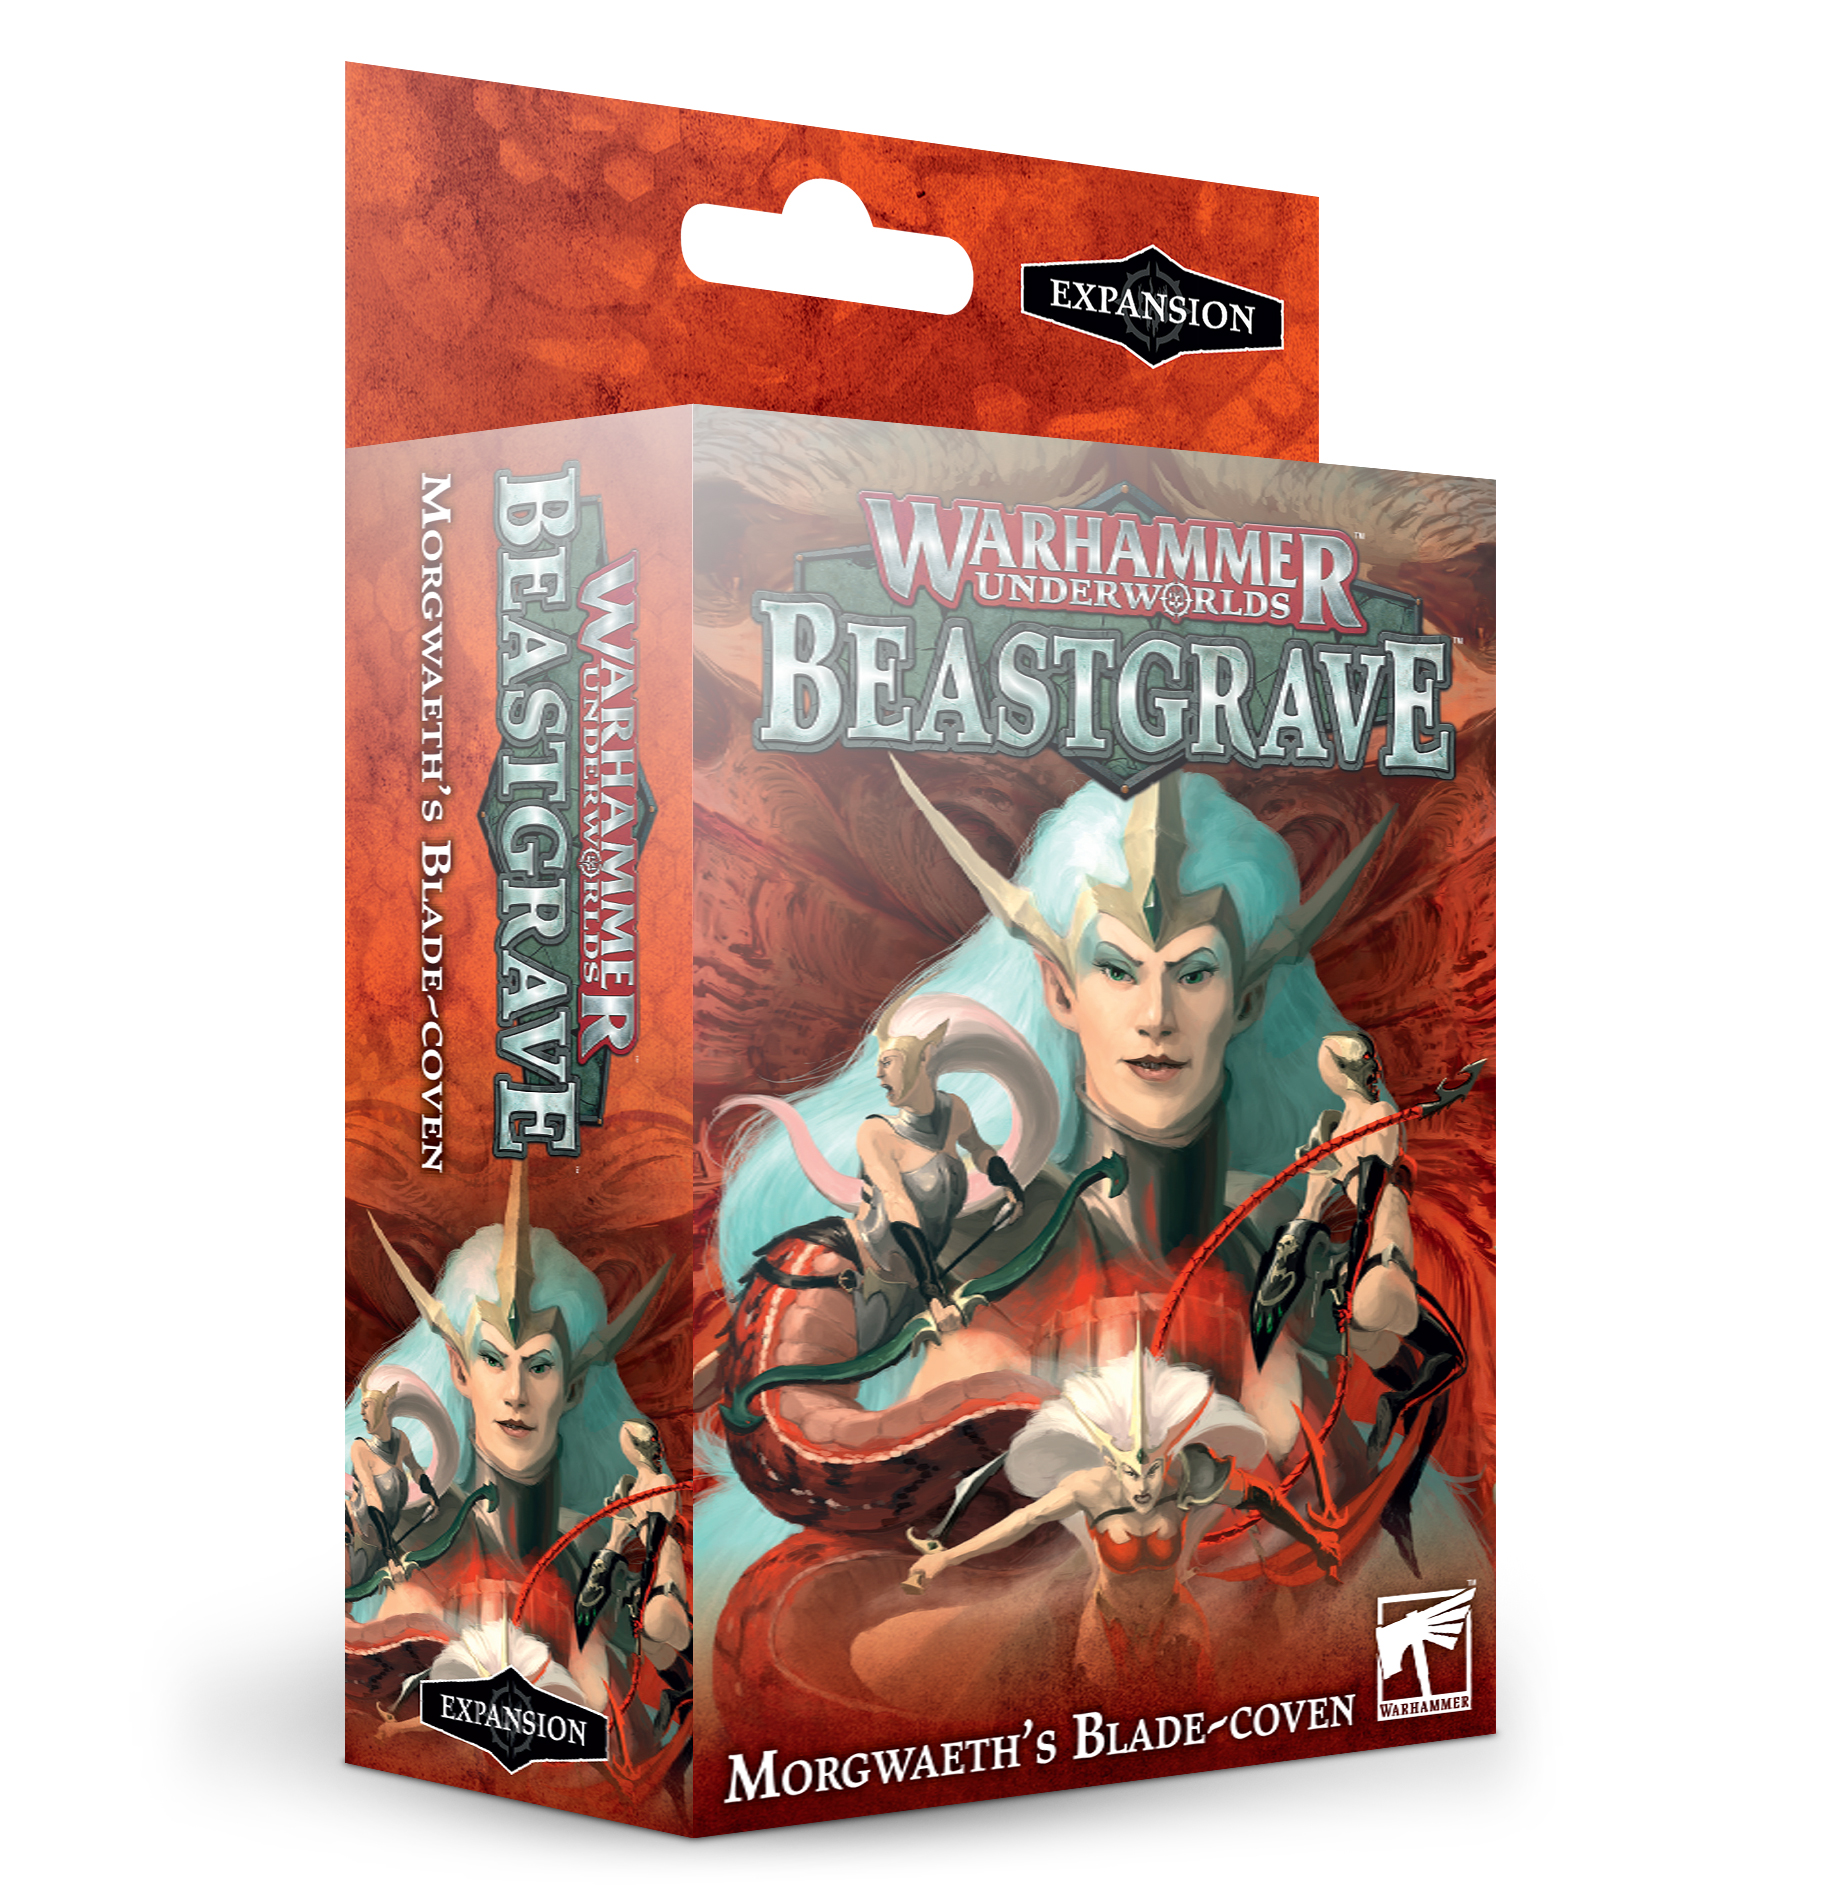 Warhammer Underworlds Beastgrave Morgwaeth's Blade-Coven -lautapelin lisäosa